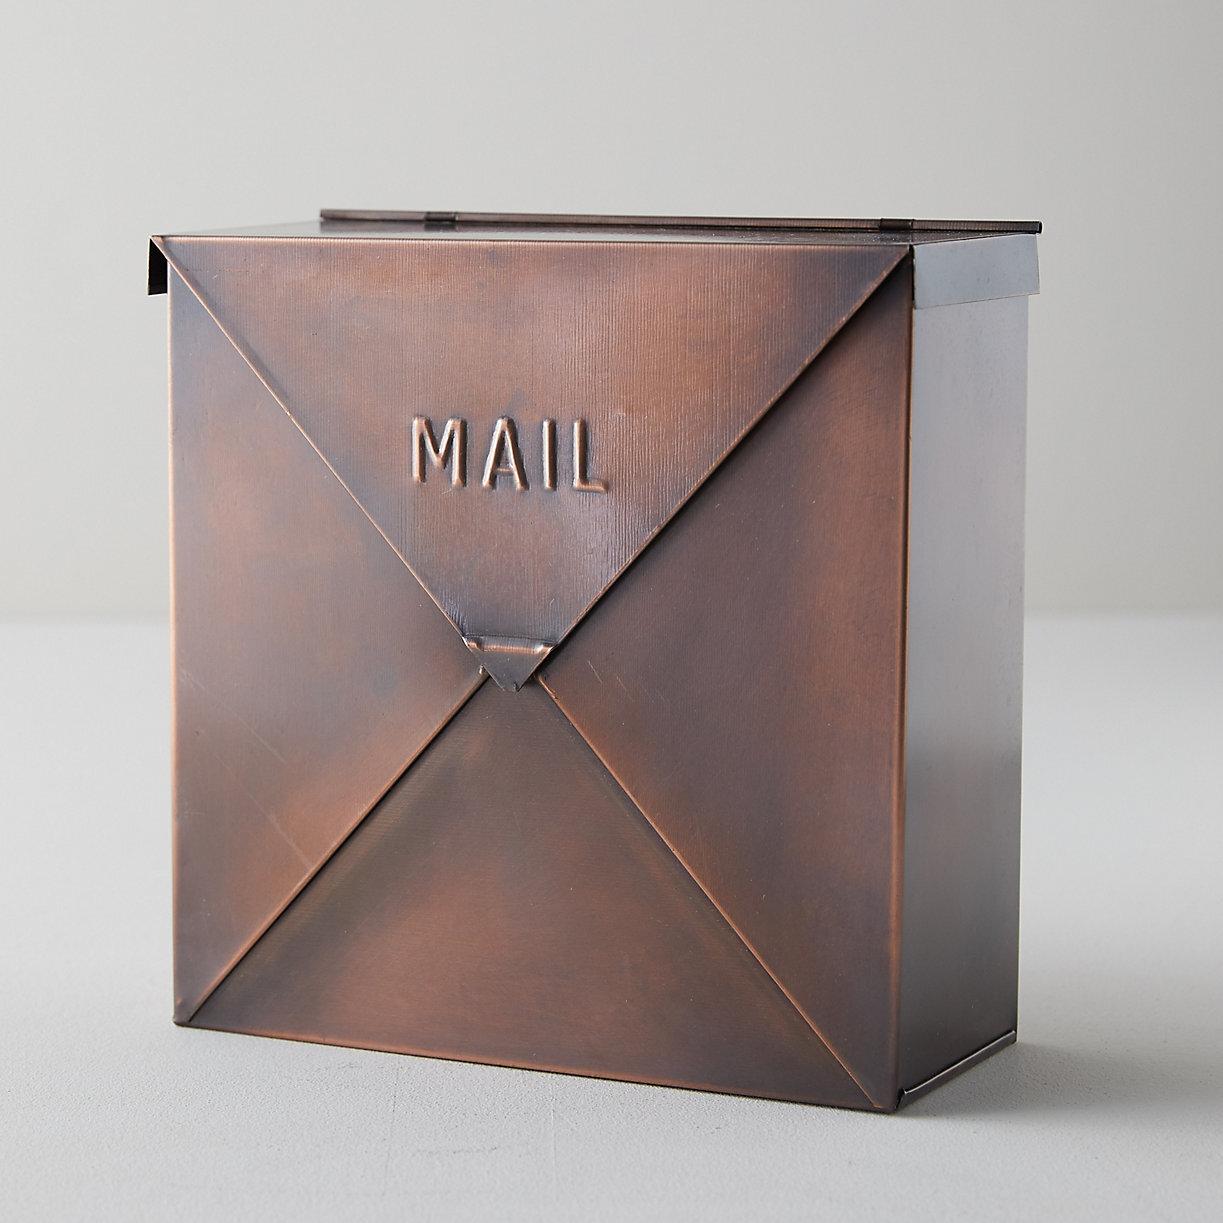 Nach Rockford Aluminum Wall Mounted Mailbox Reviews Wayfair